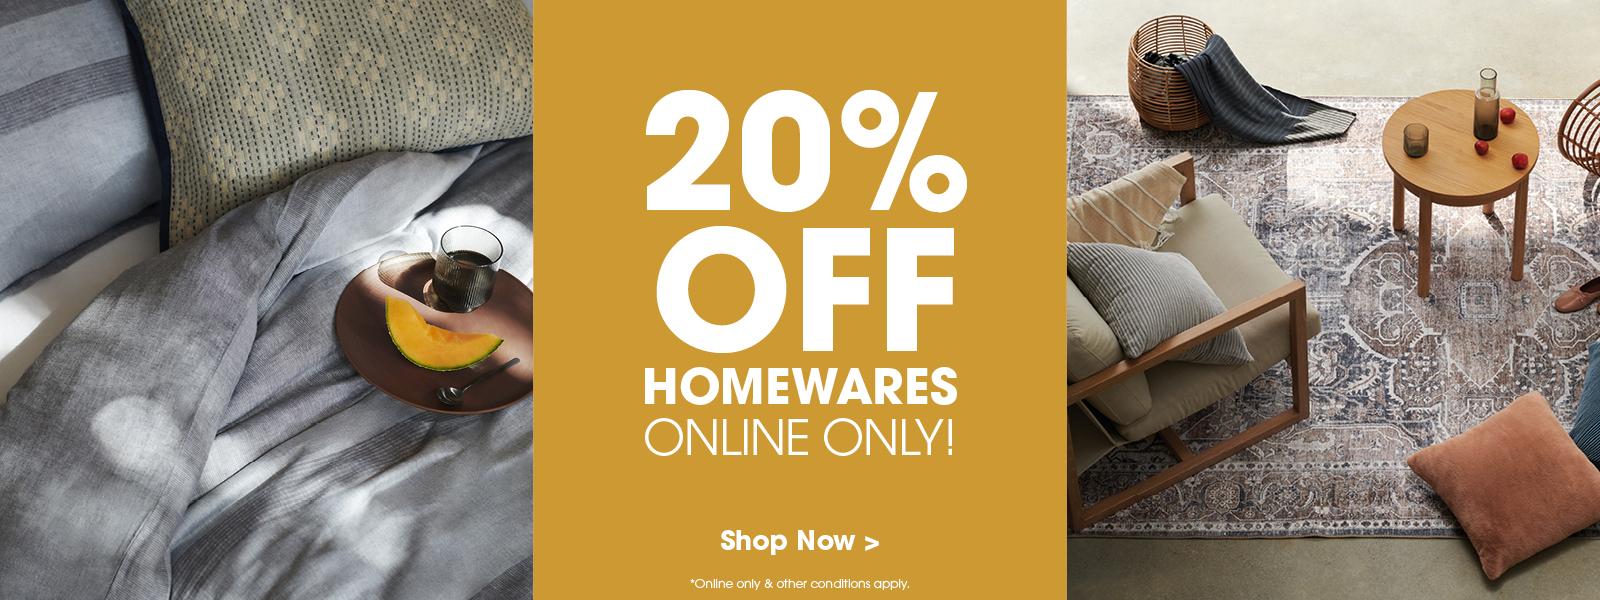 20% Off All Homewares